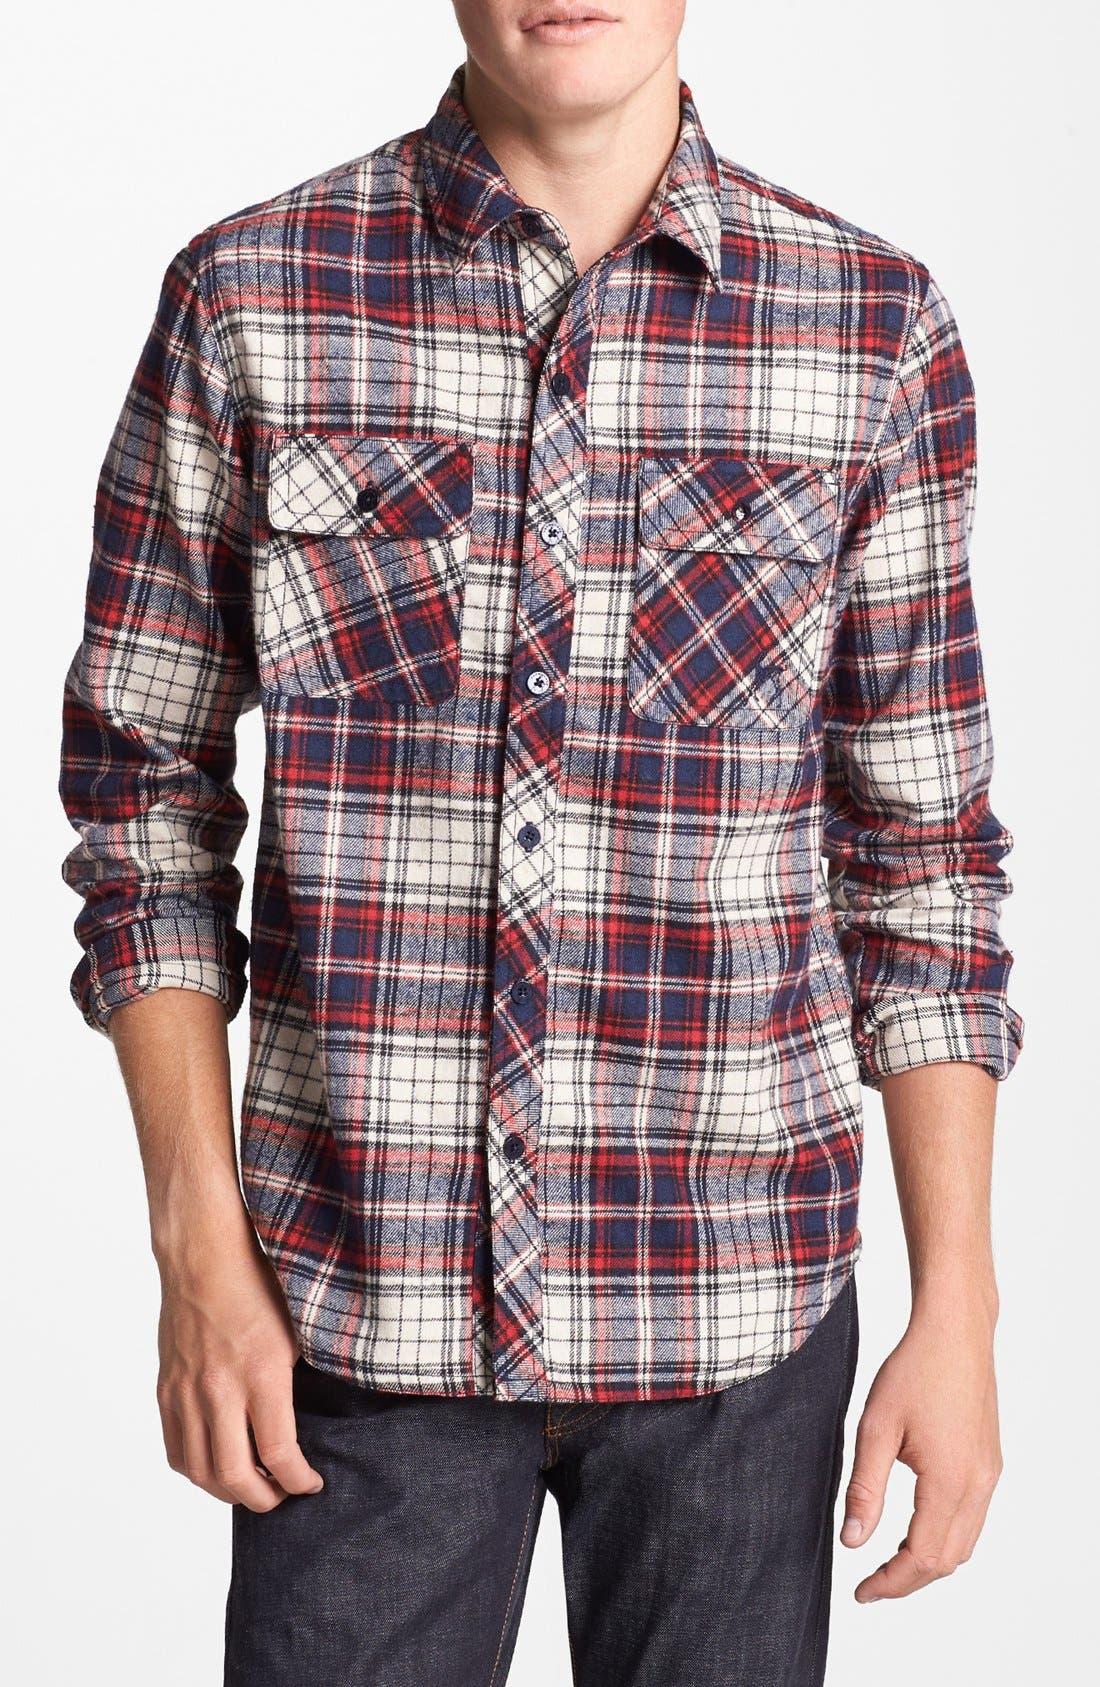 Alternate Image 1 Selected - Kane & Unke 'Darin's Fave' Plaid Flannel Shirt